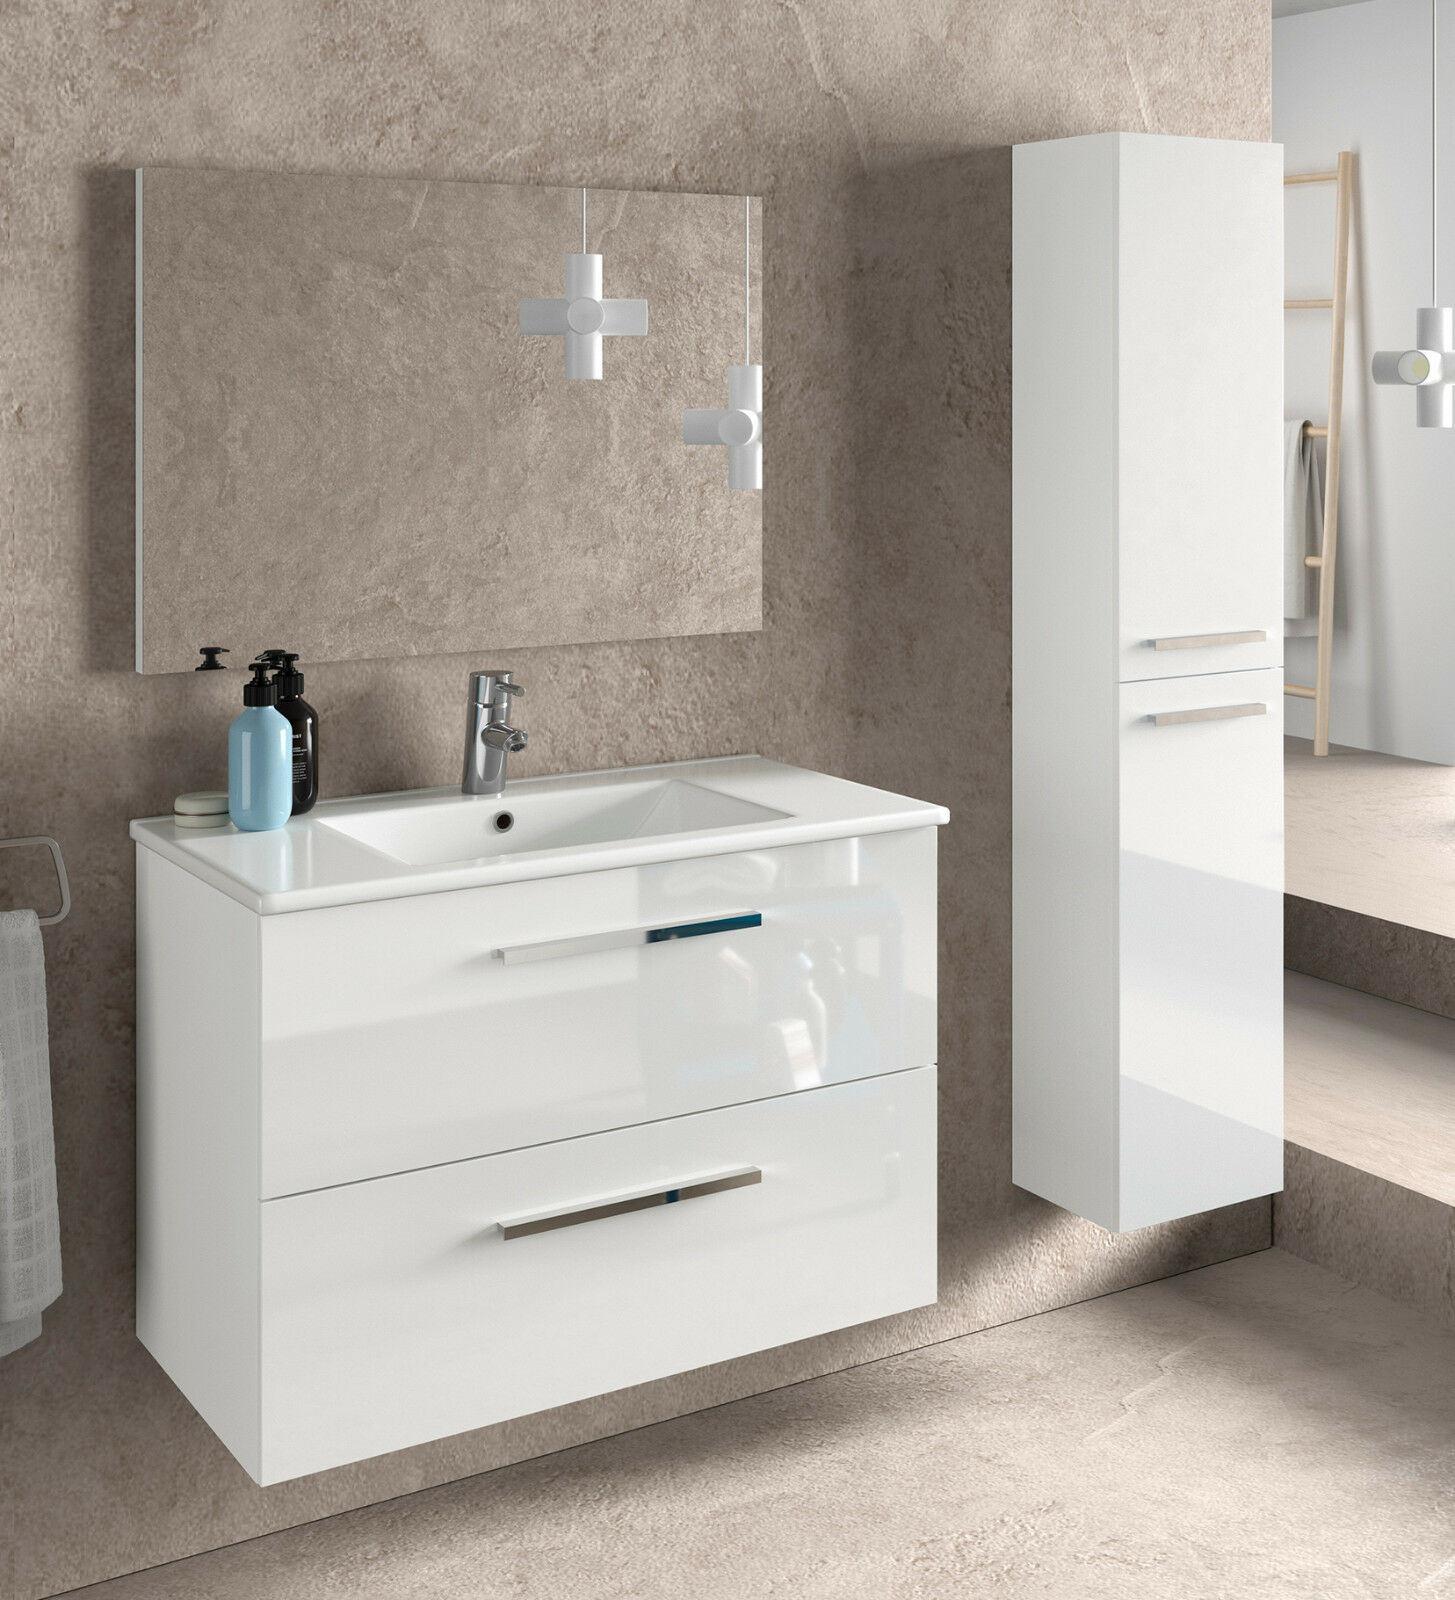 China Bathroom Furniture Set 2 Drawers